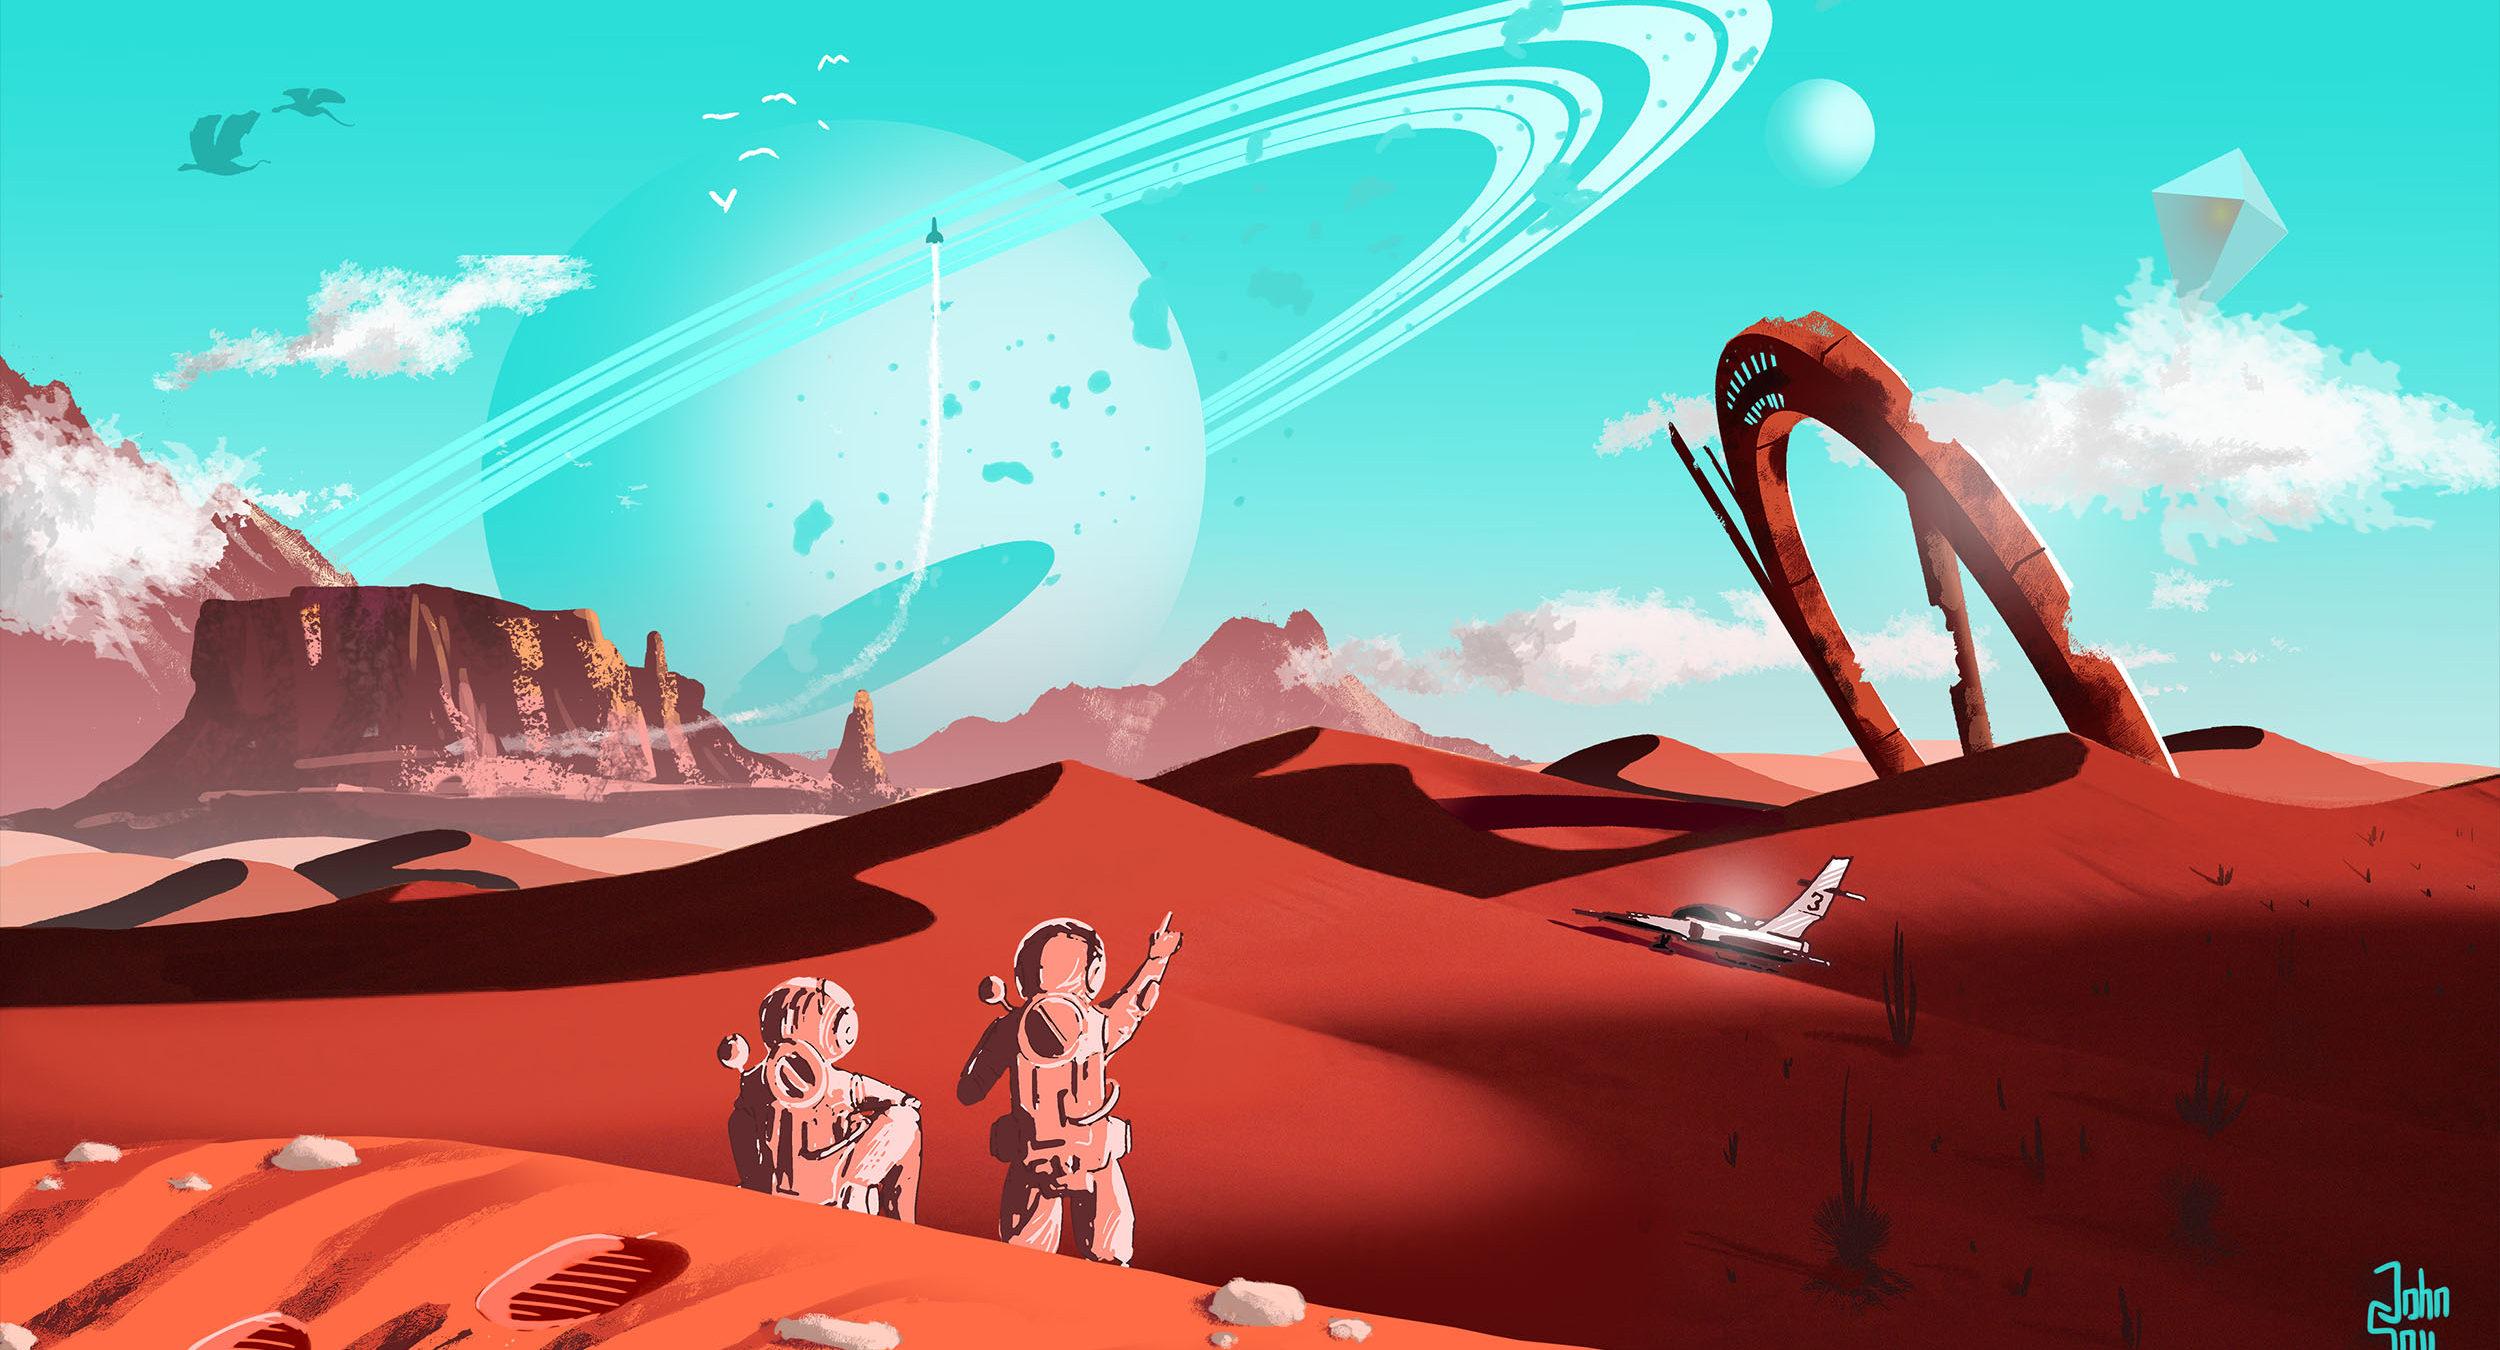 sci-fi saturday: 06.27.2787